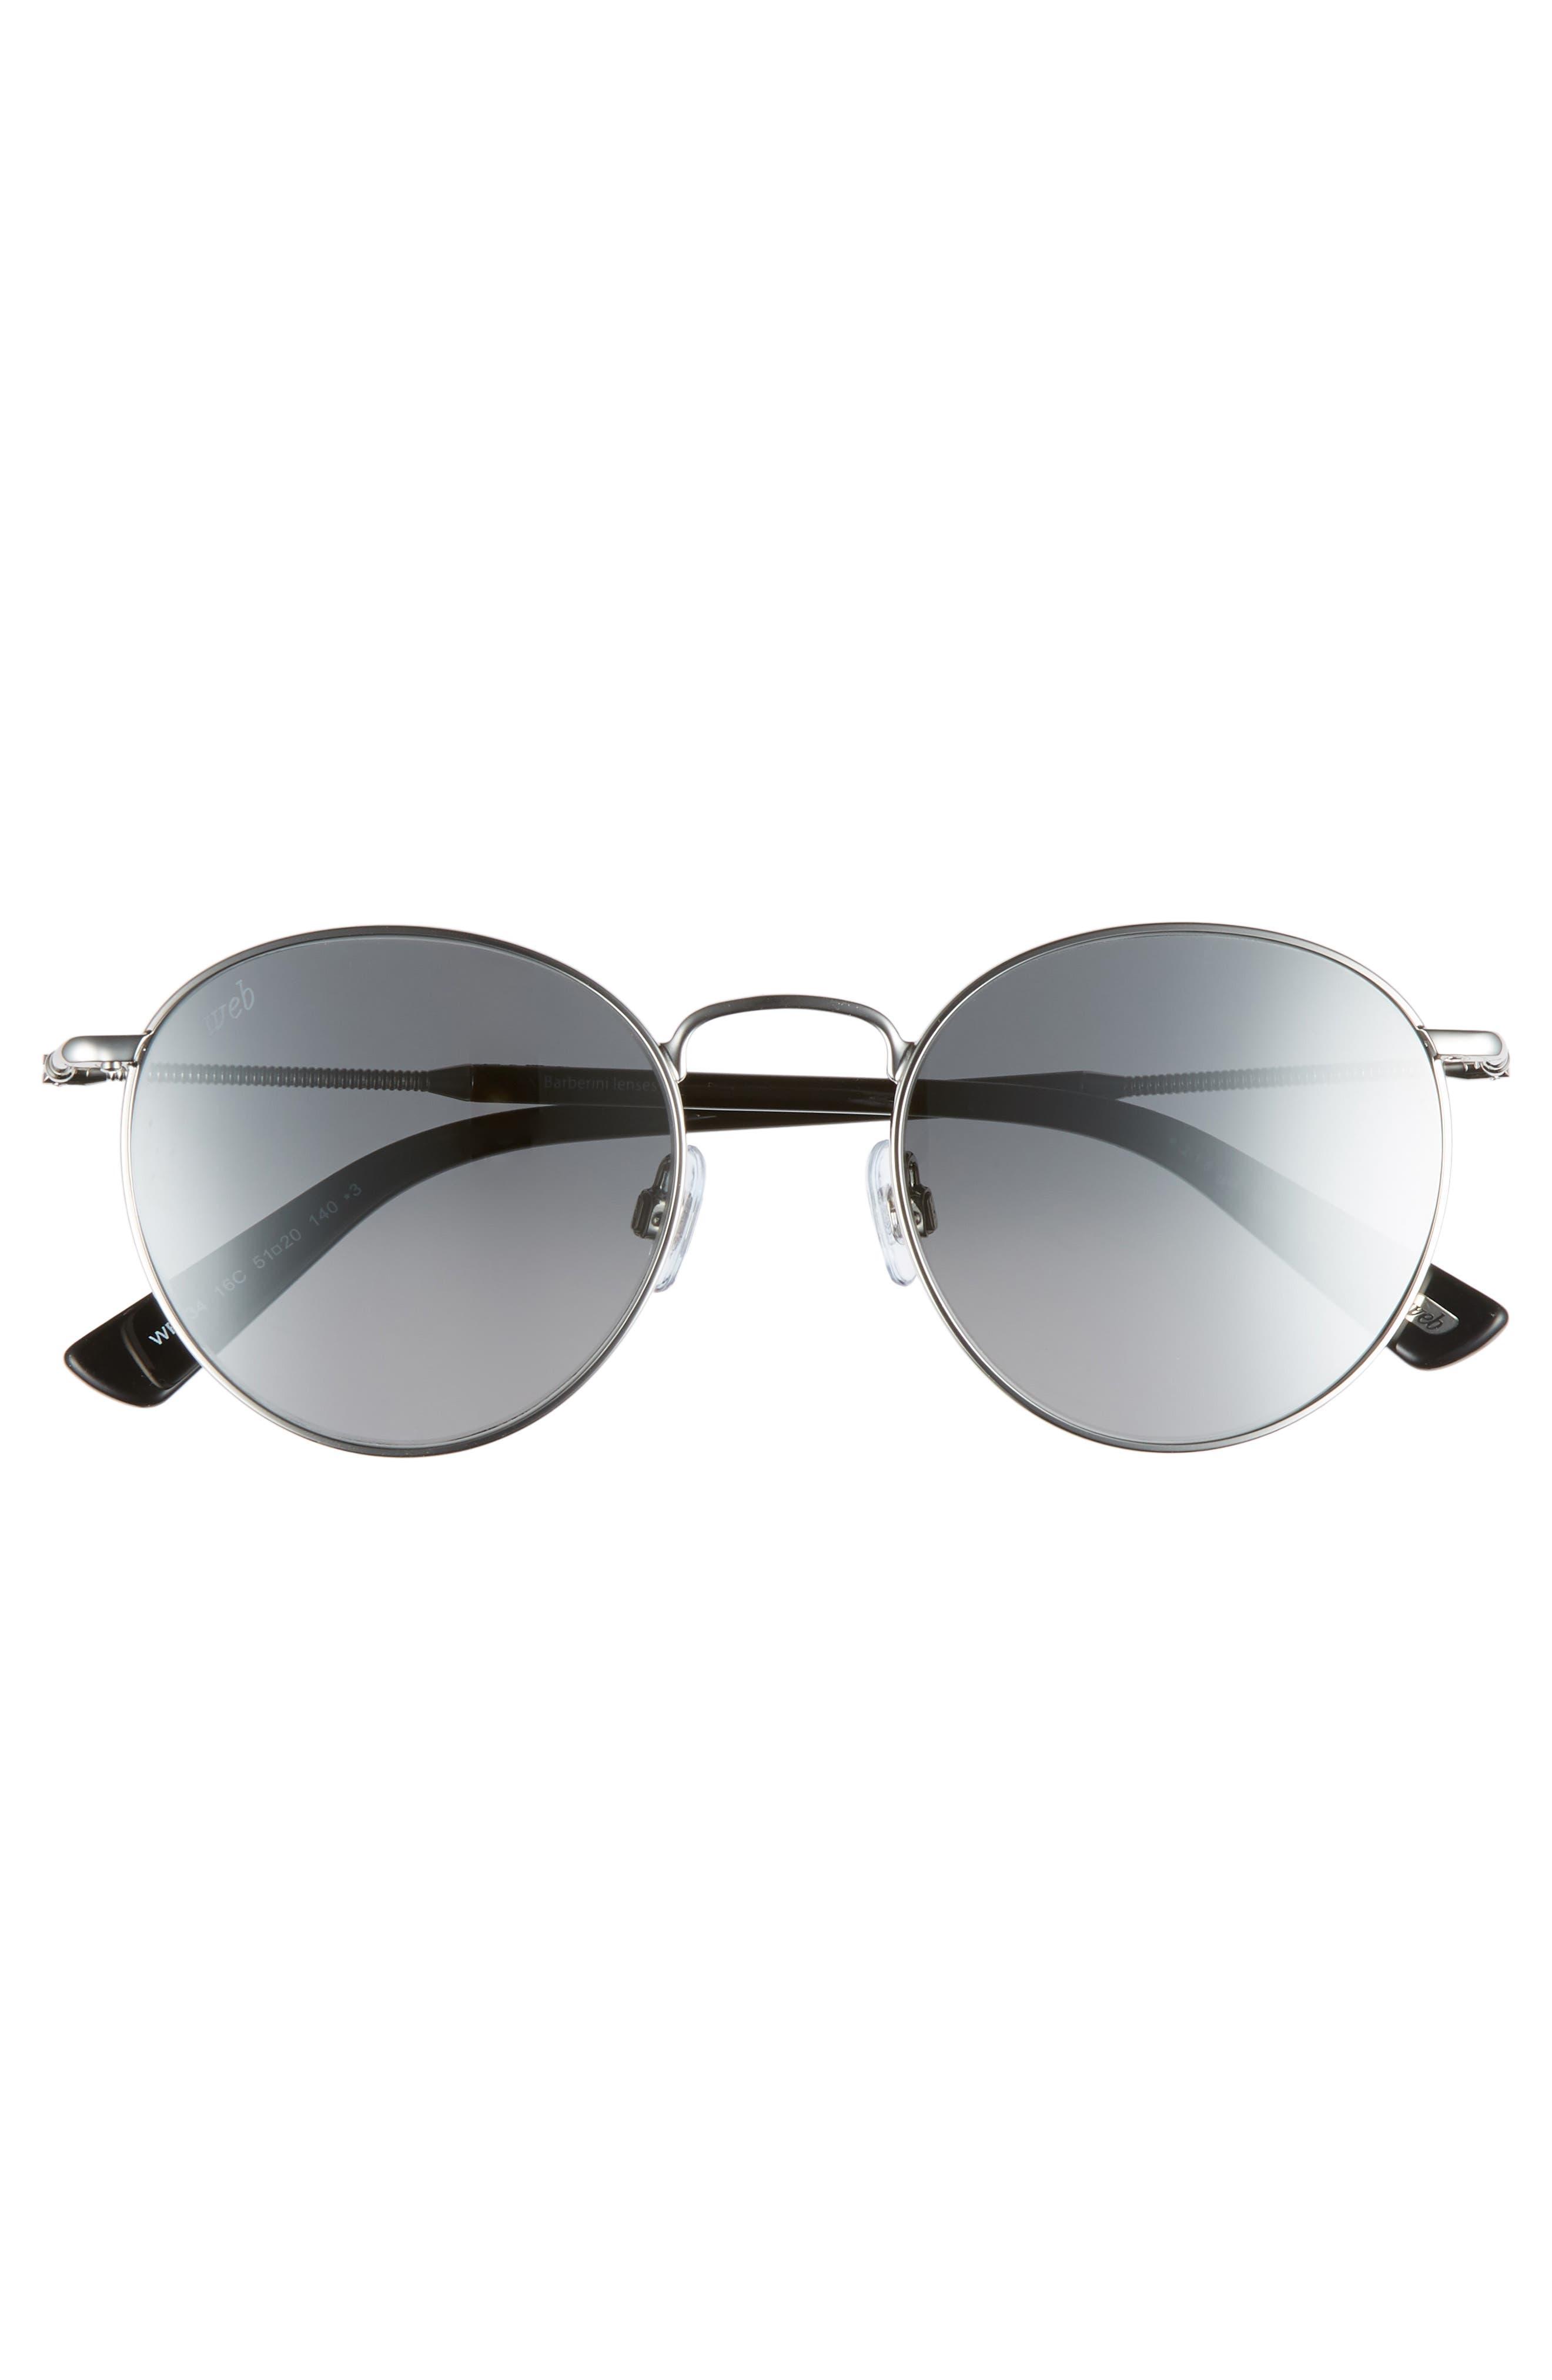 51mm Round Metal Sunglasses,                             Alternate thumbnail 3, color,                             Shiny Palladium/ Smoke Mirror